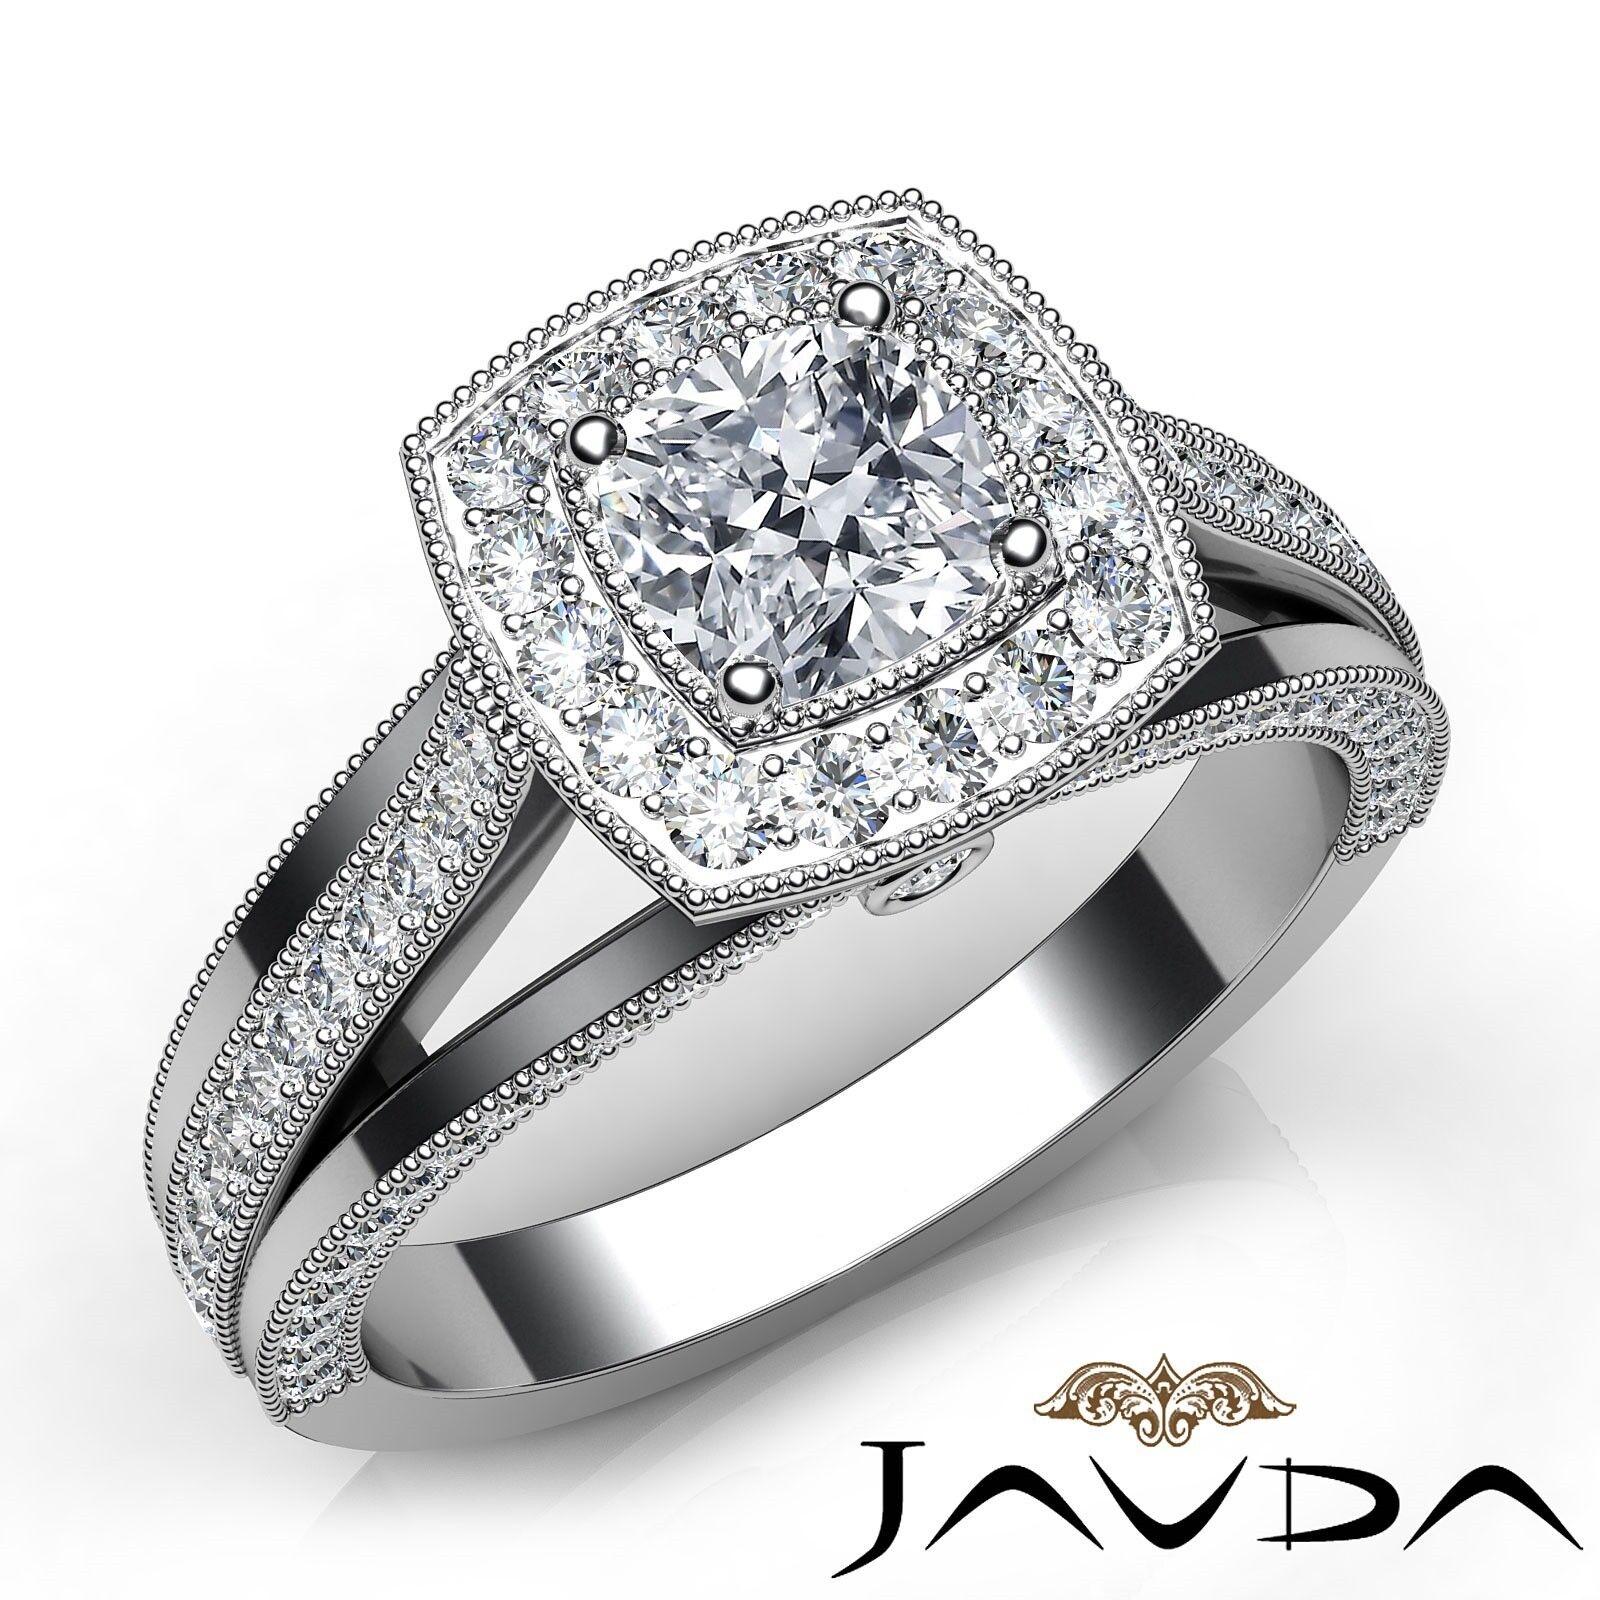 1.86ctw Milgrain Halo Bezel Cushion Diamond Engagement Ring GIA F-SI2 White Gold